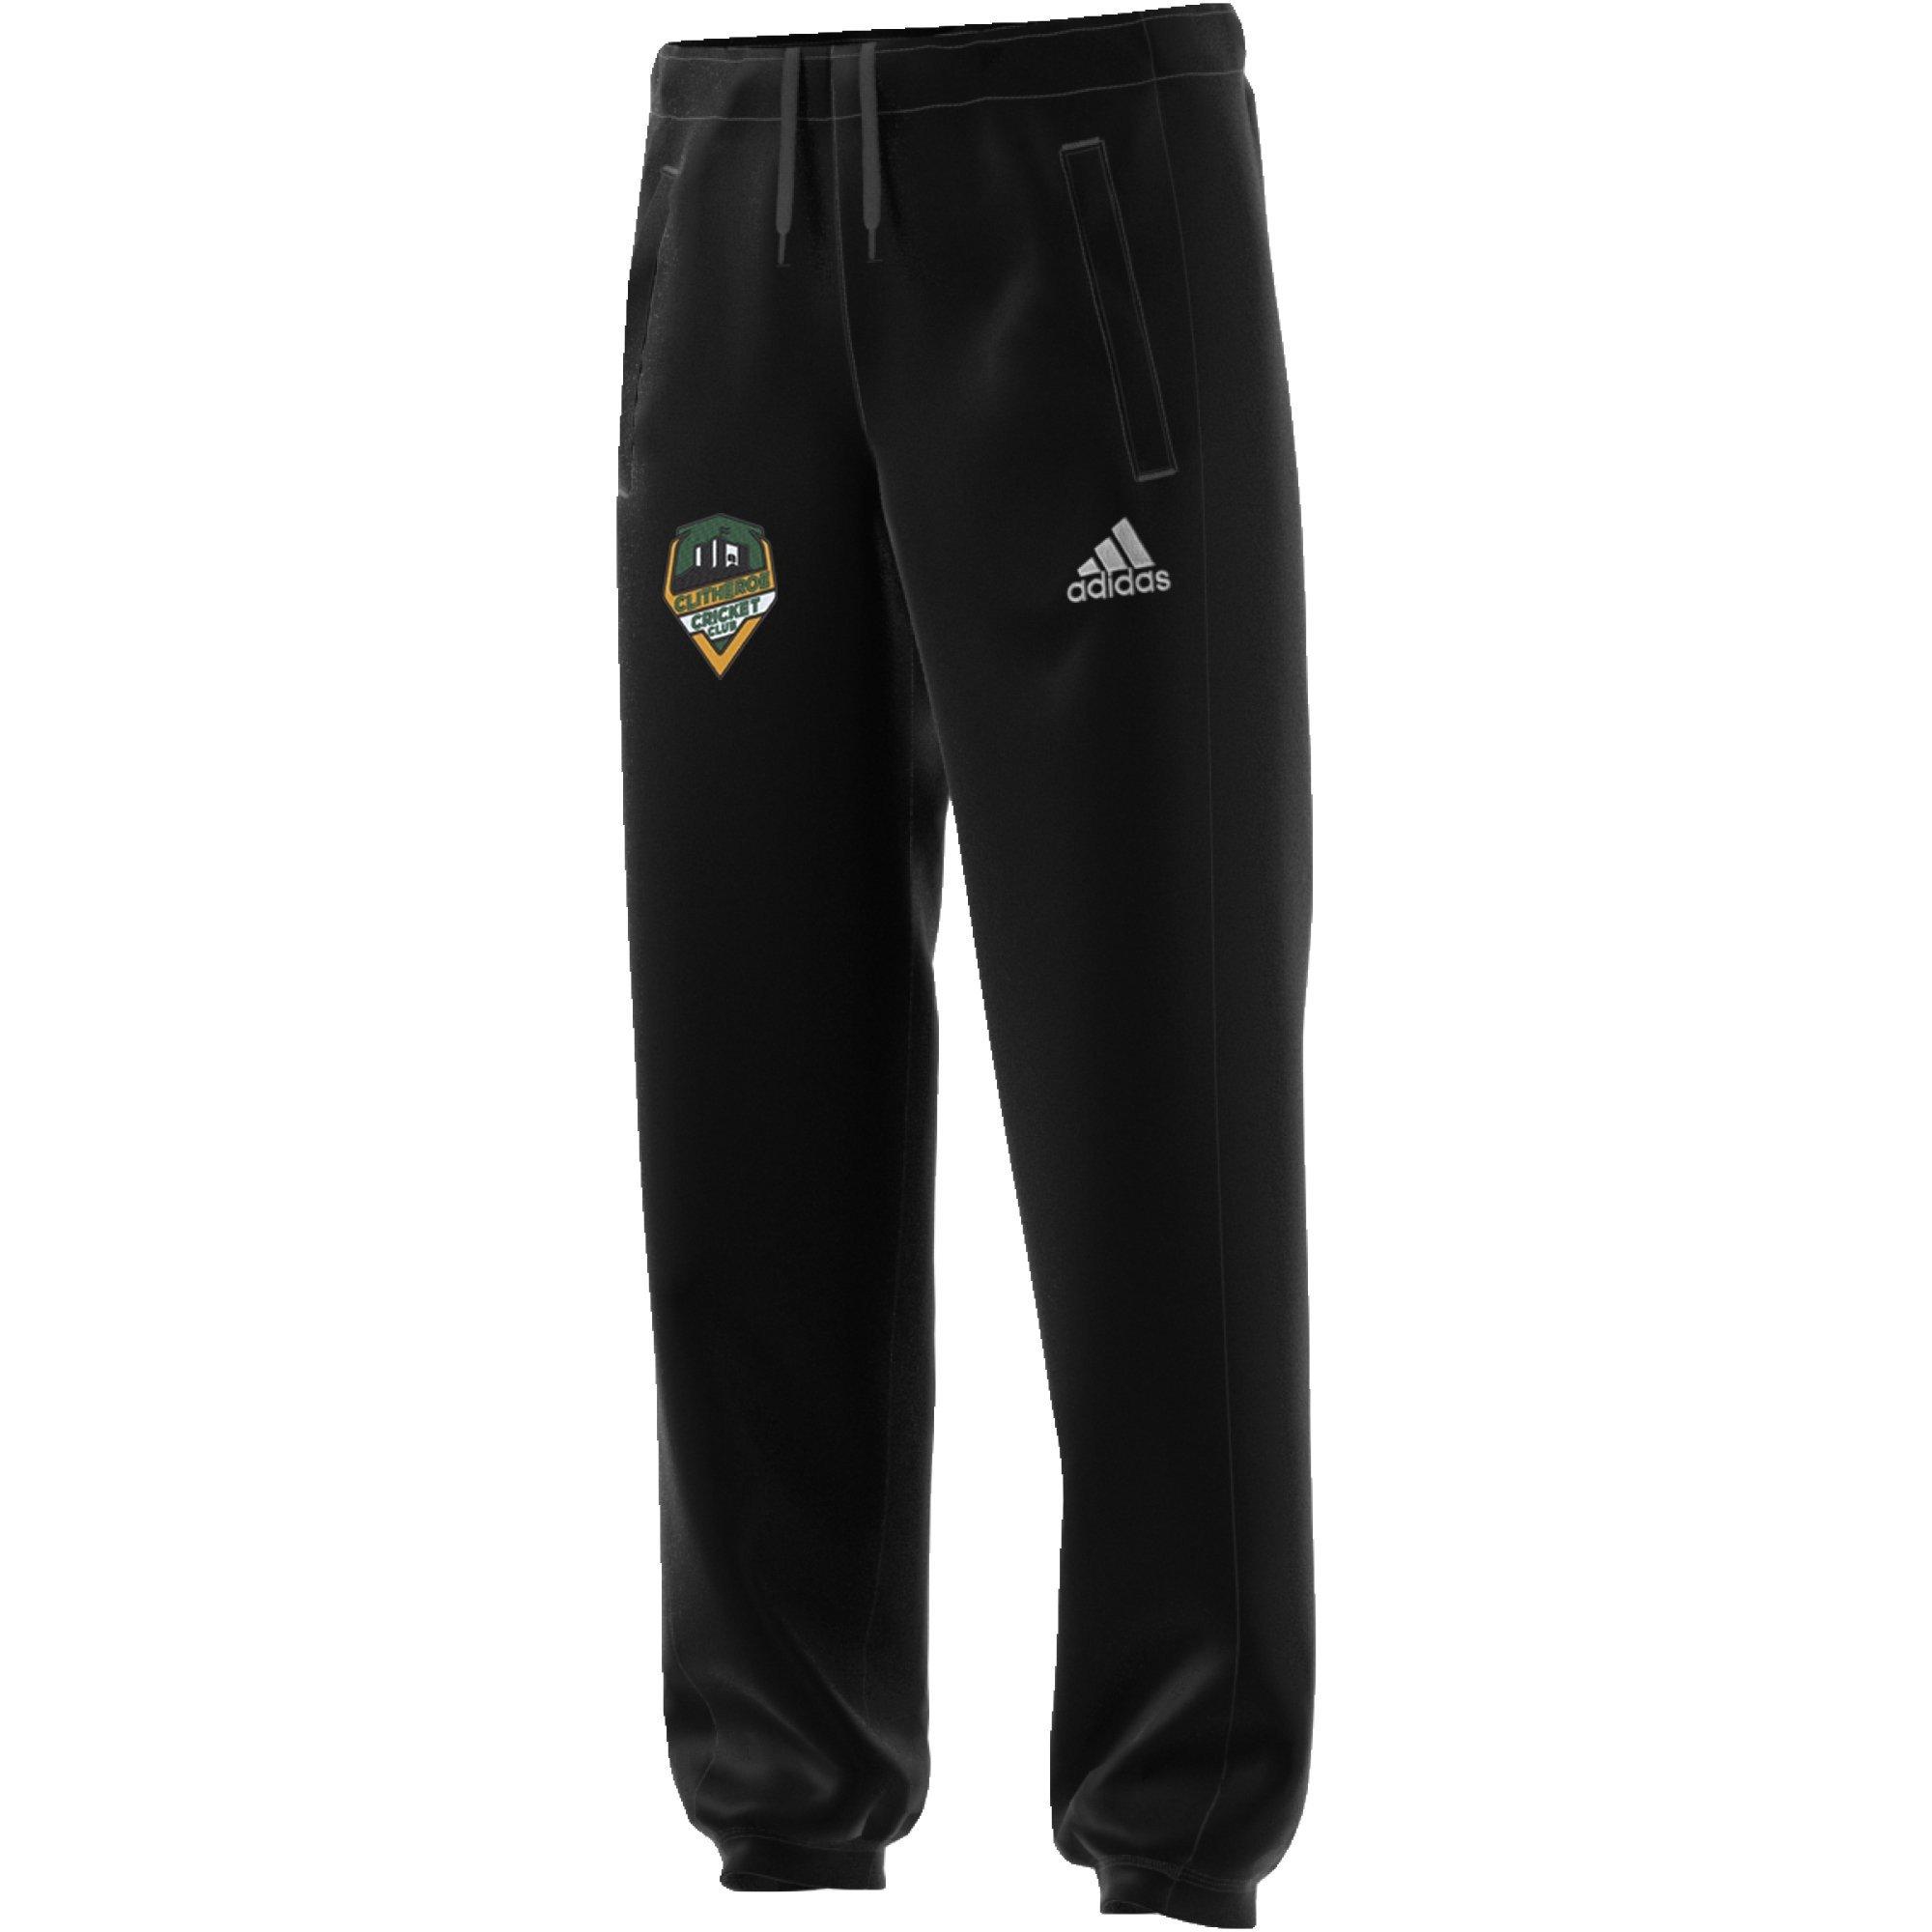 Clitheroe CC Adidas Black Sweat Pants